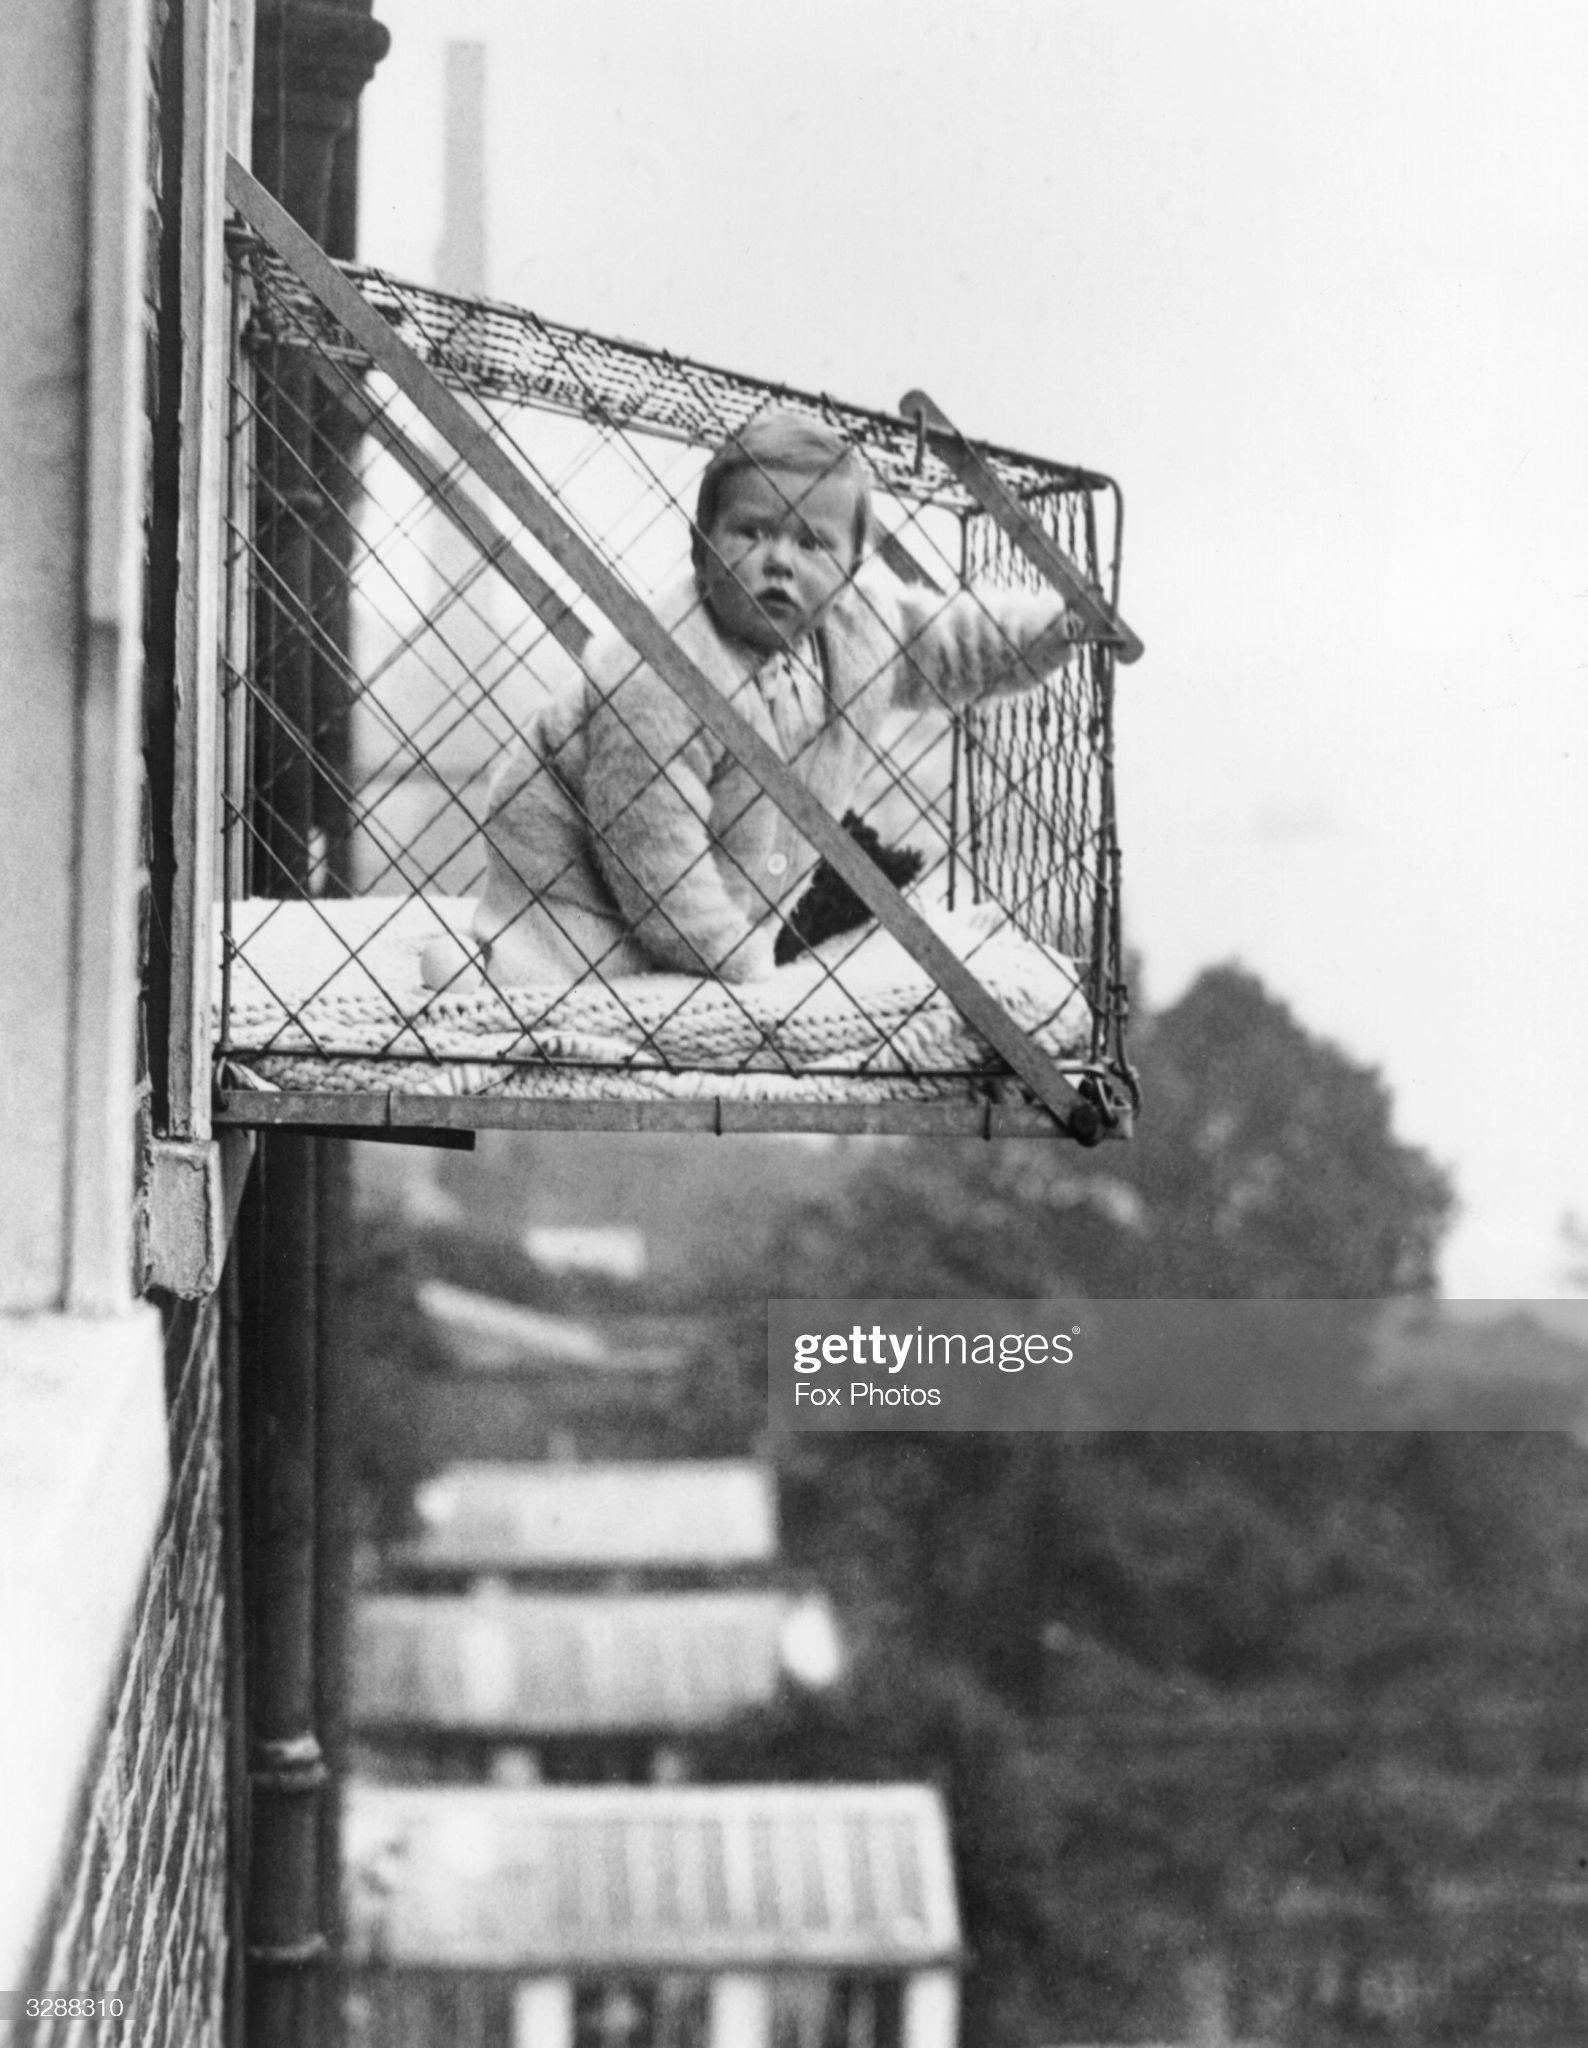 Baby Cage: Novinky